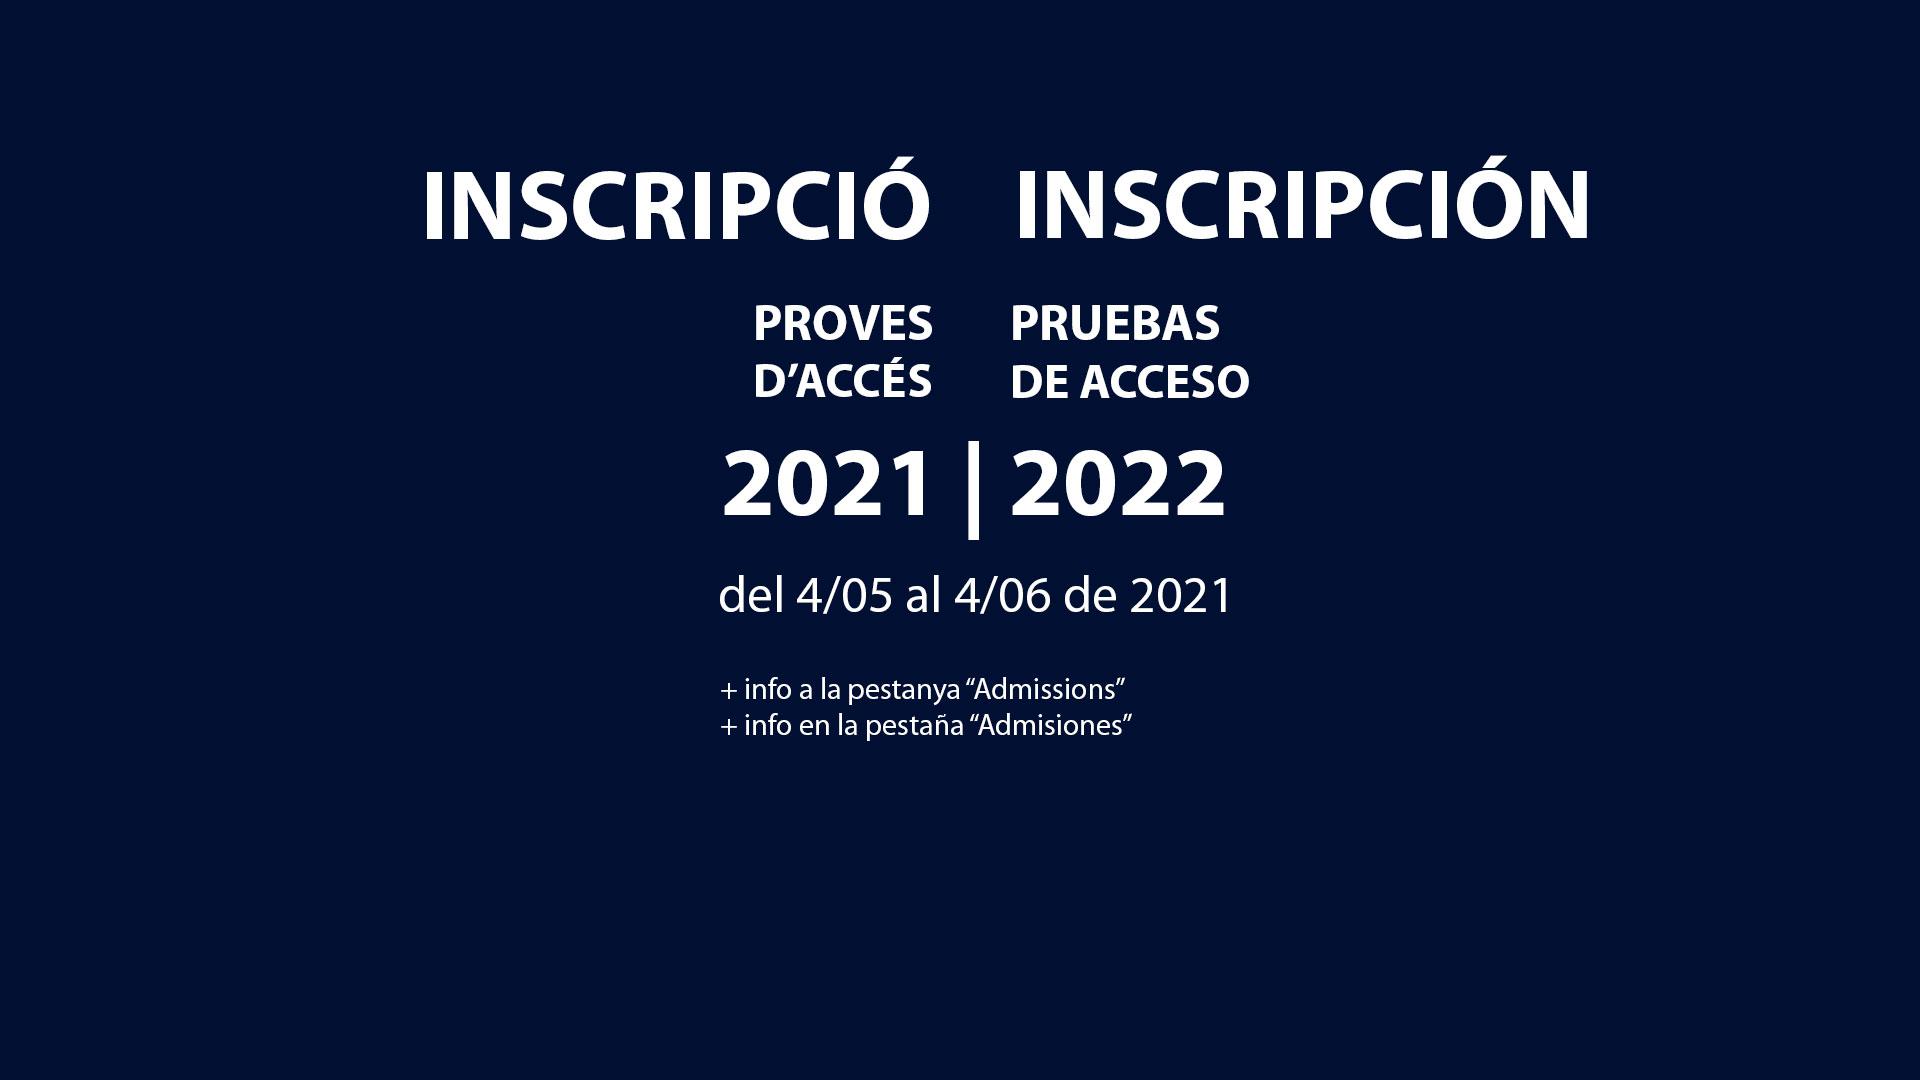 Proves_acces_2021_2022